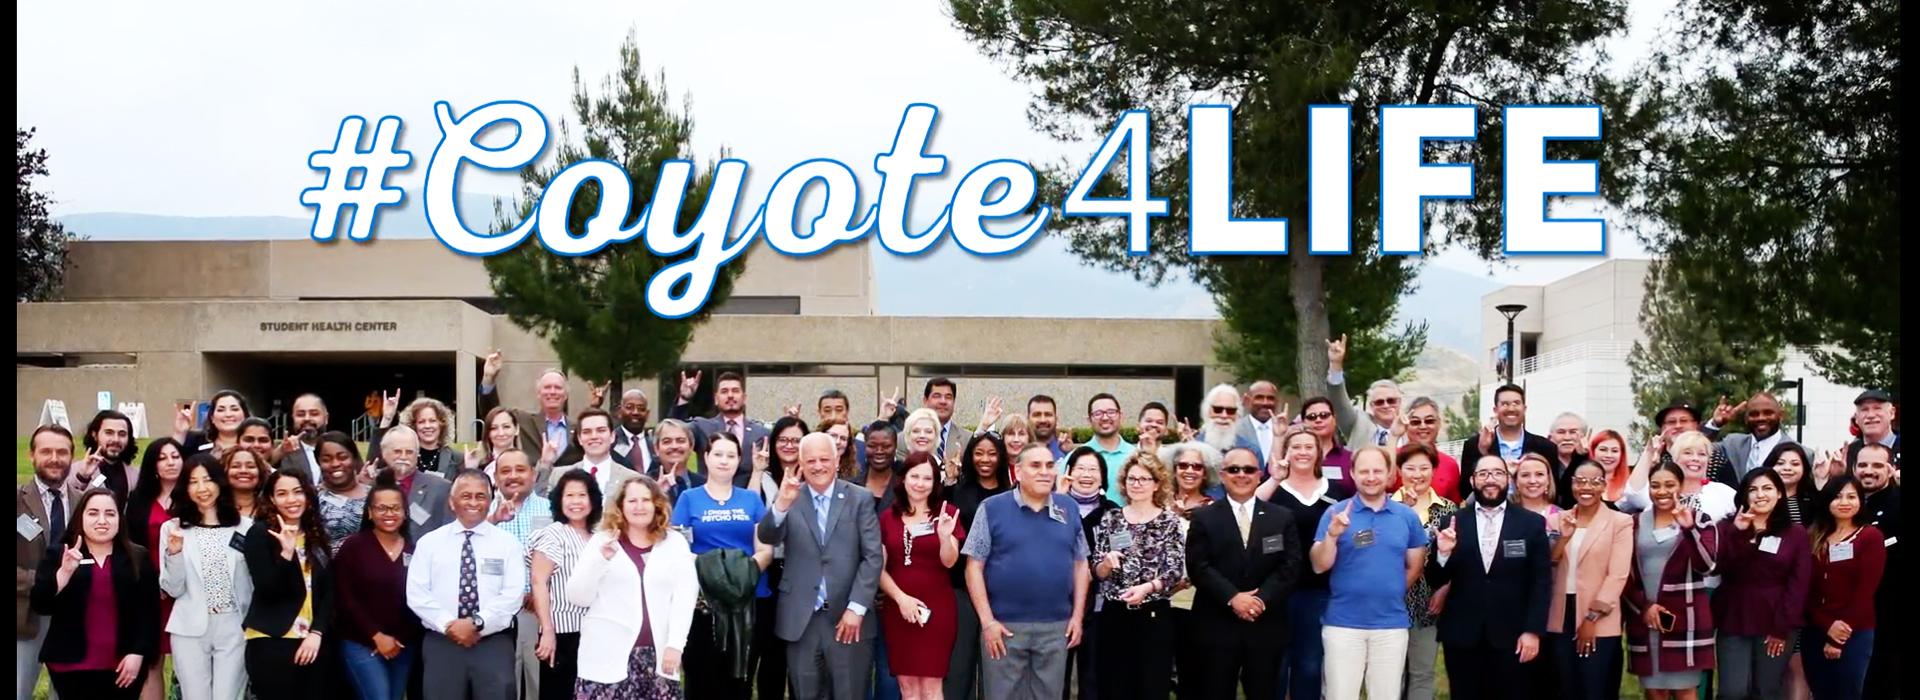 CSUSB Alumni 2019 Highlights